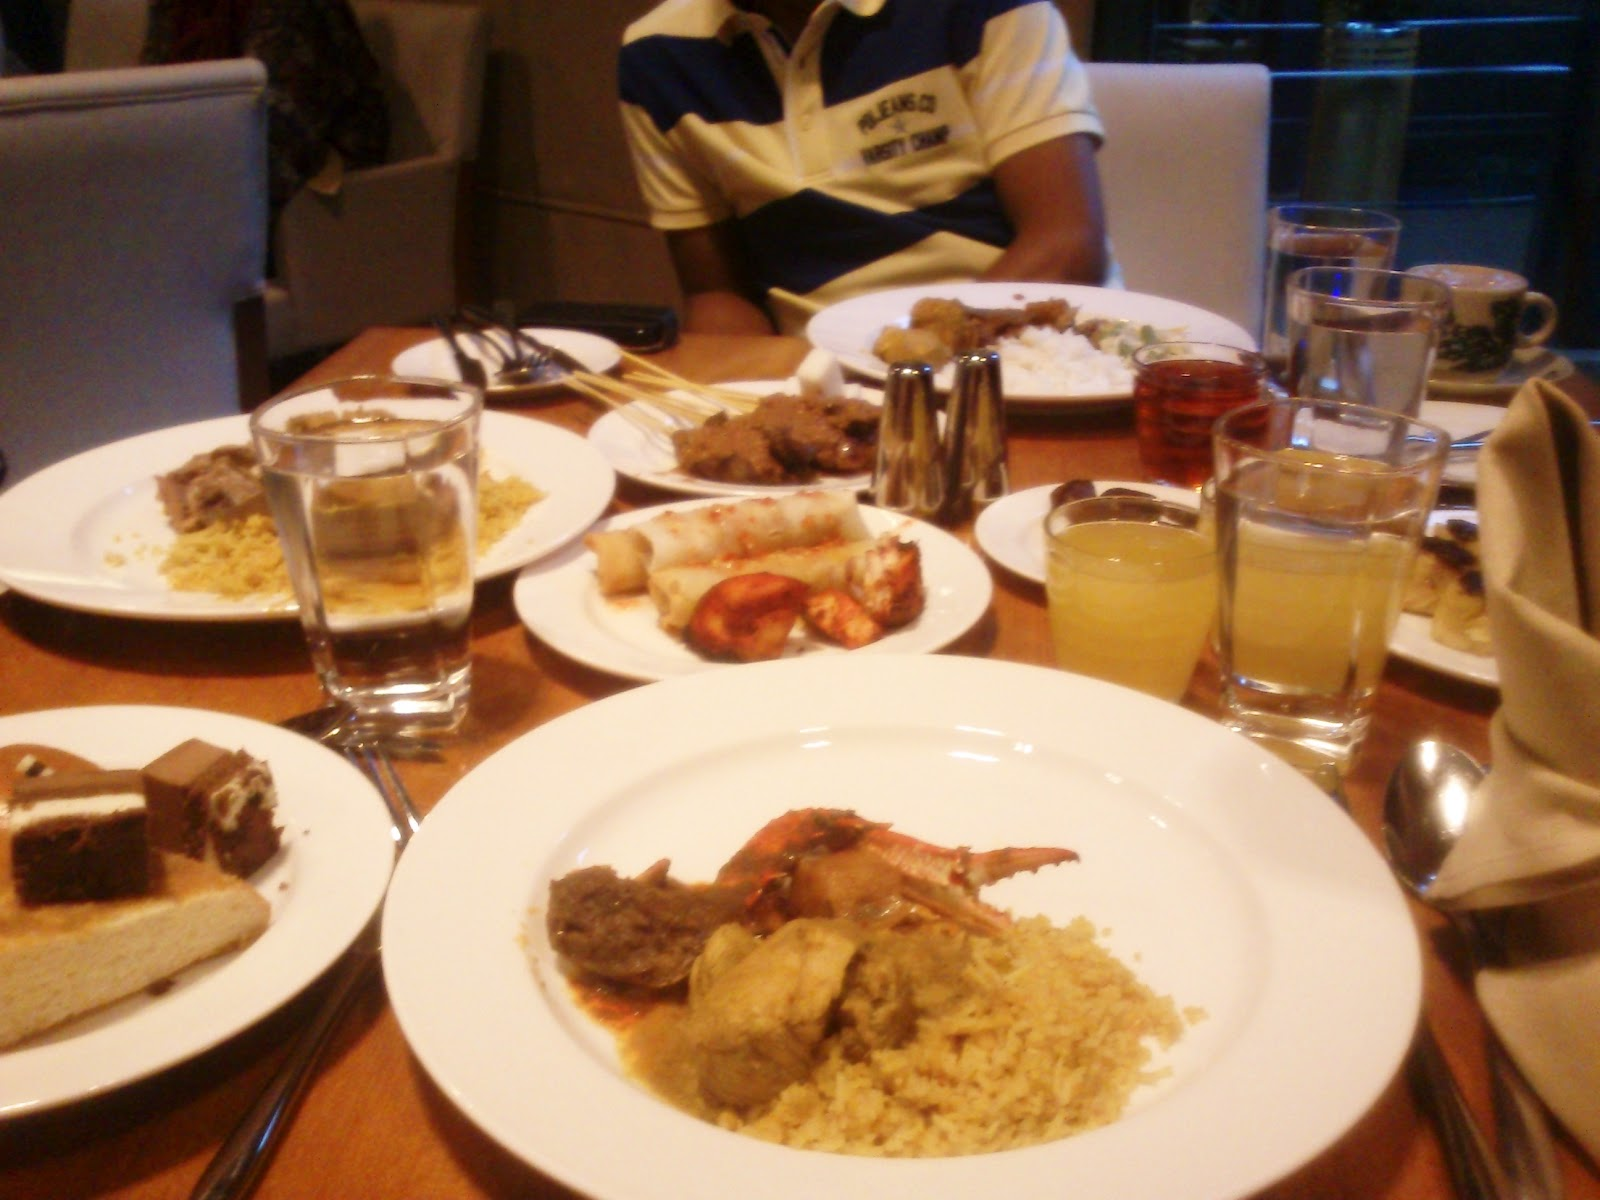 5 Restoran All You Can Eat Paling Recommended di Bandung, Murah Pula